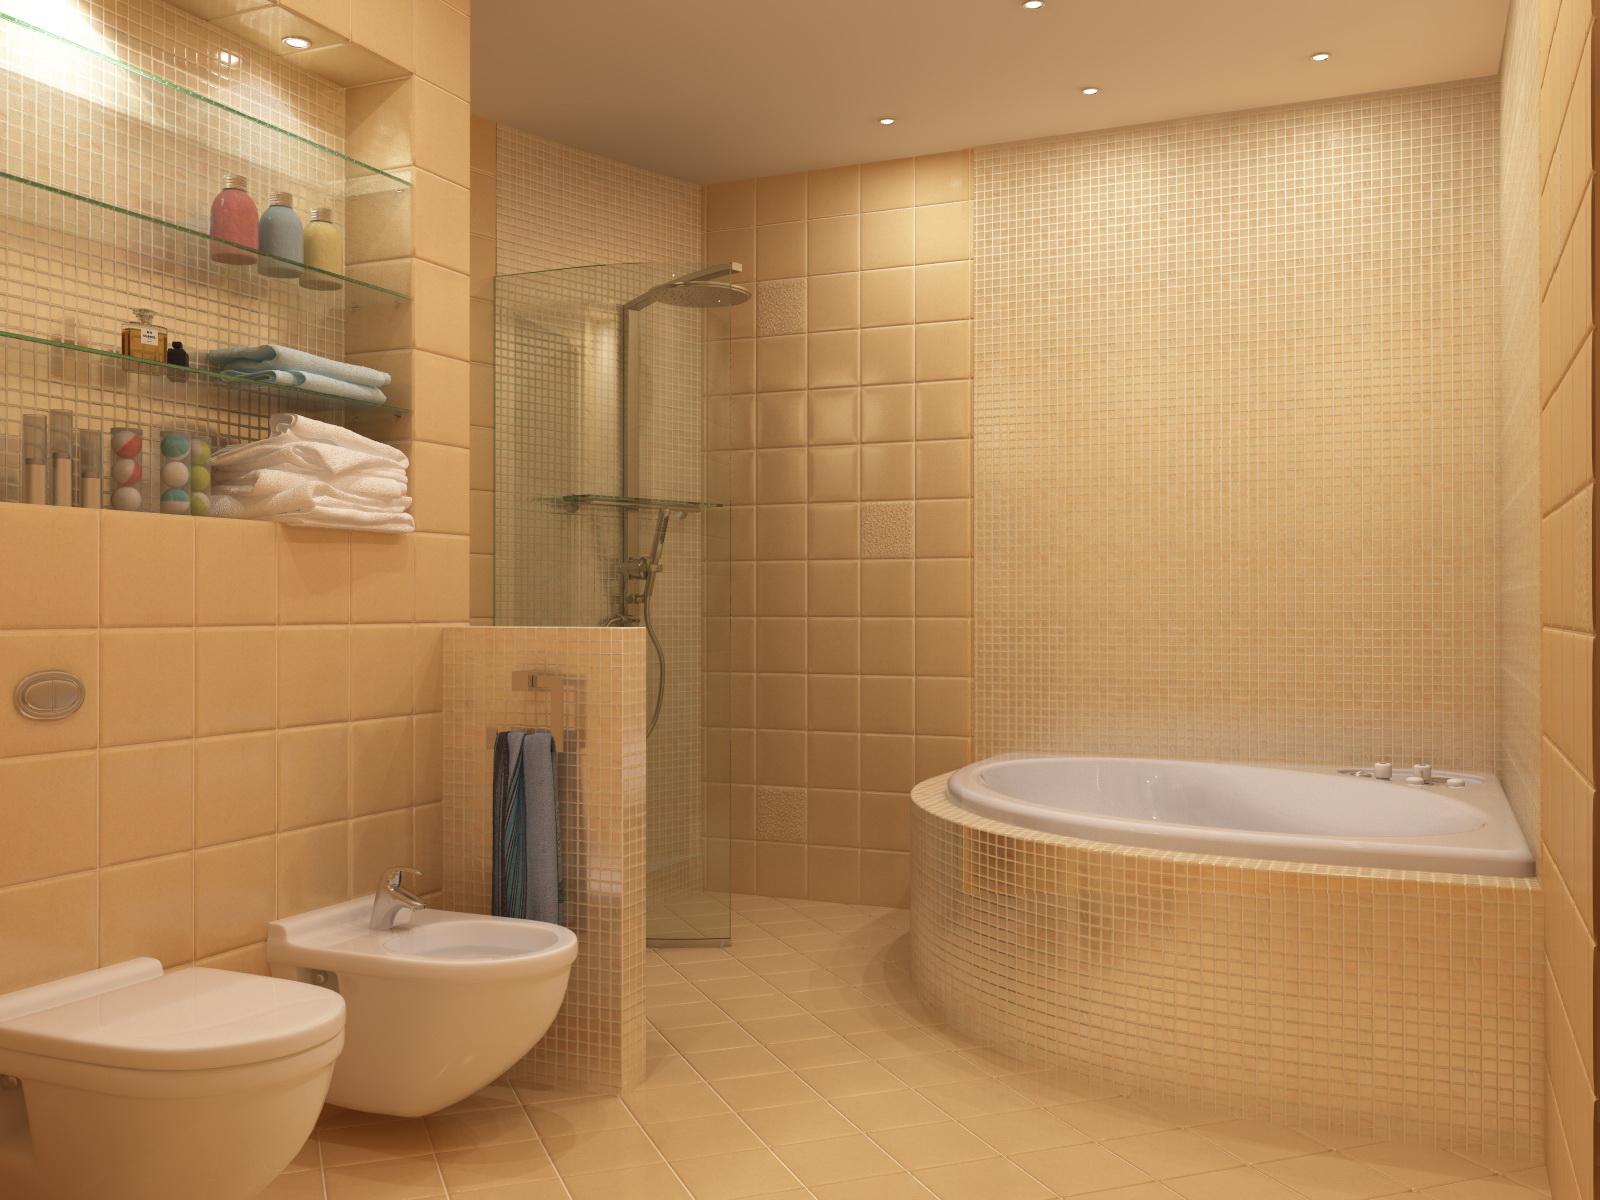 Дизайн ванны своими руками программа онлайн